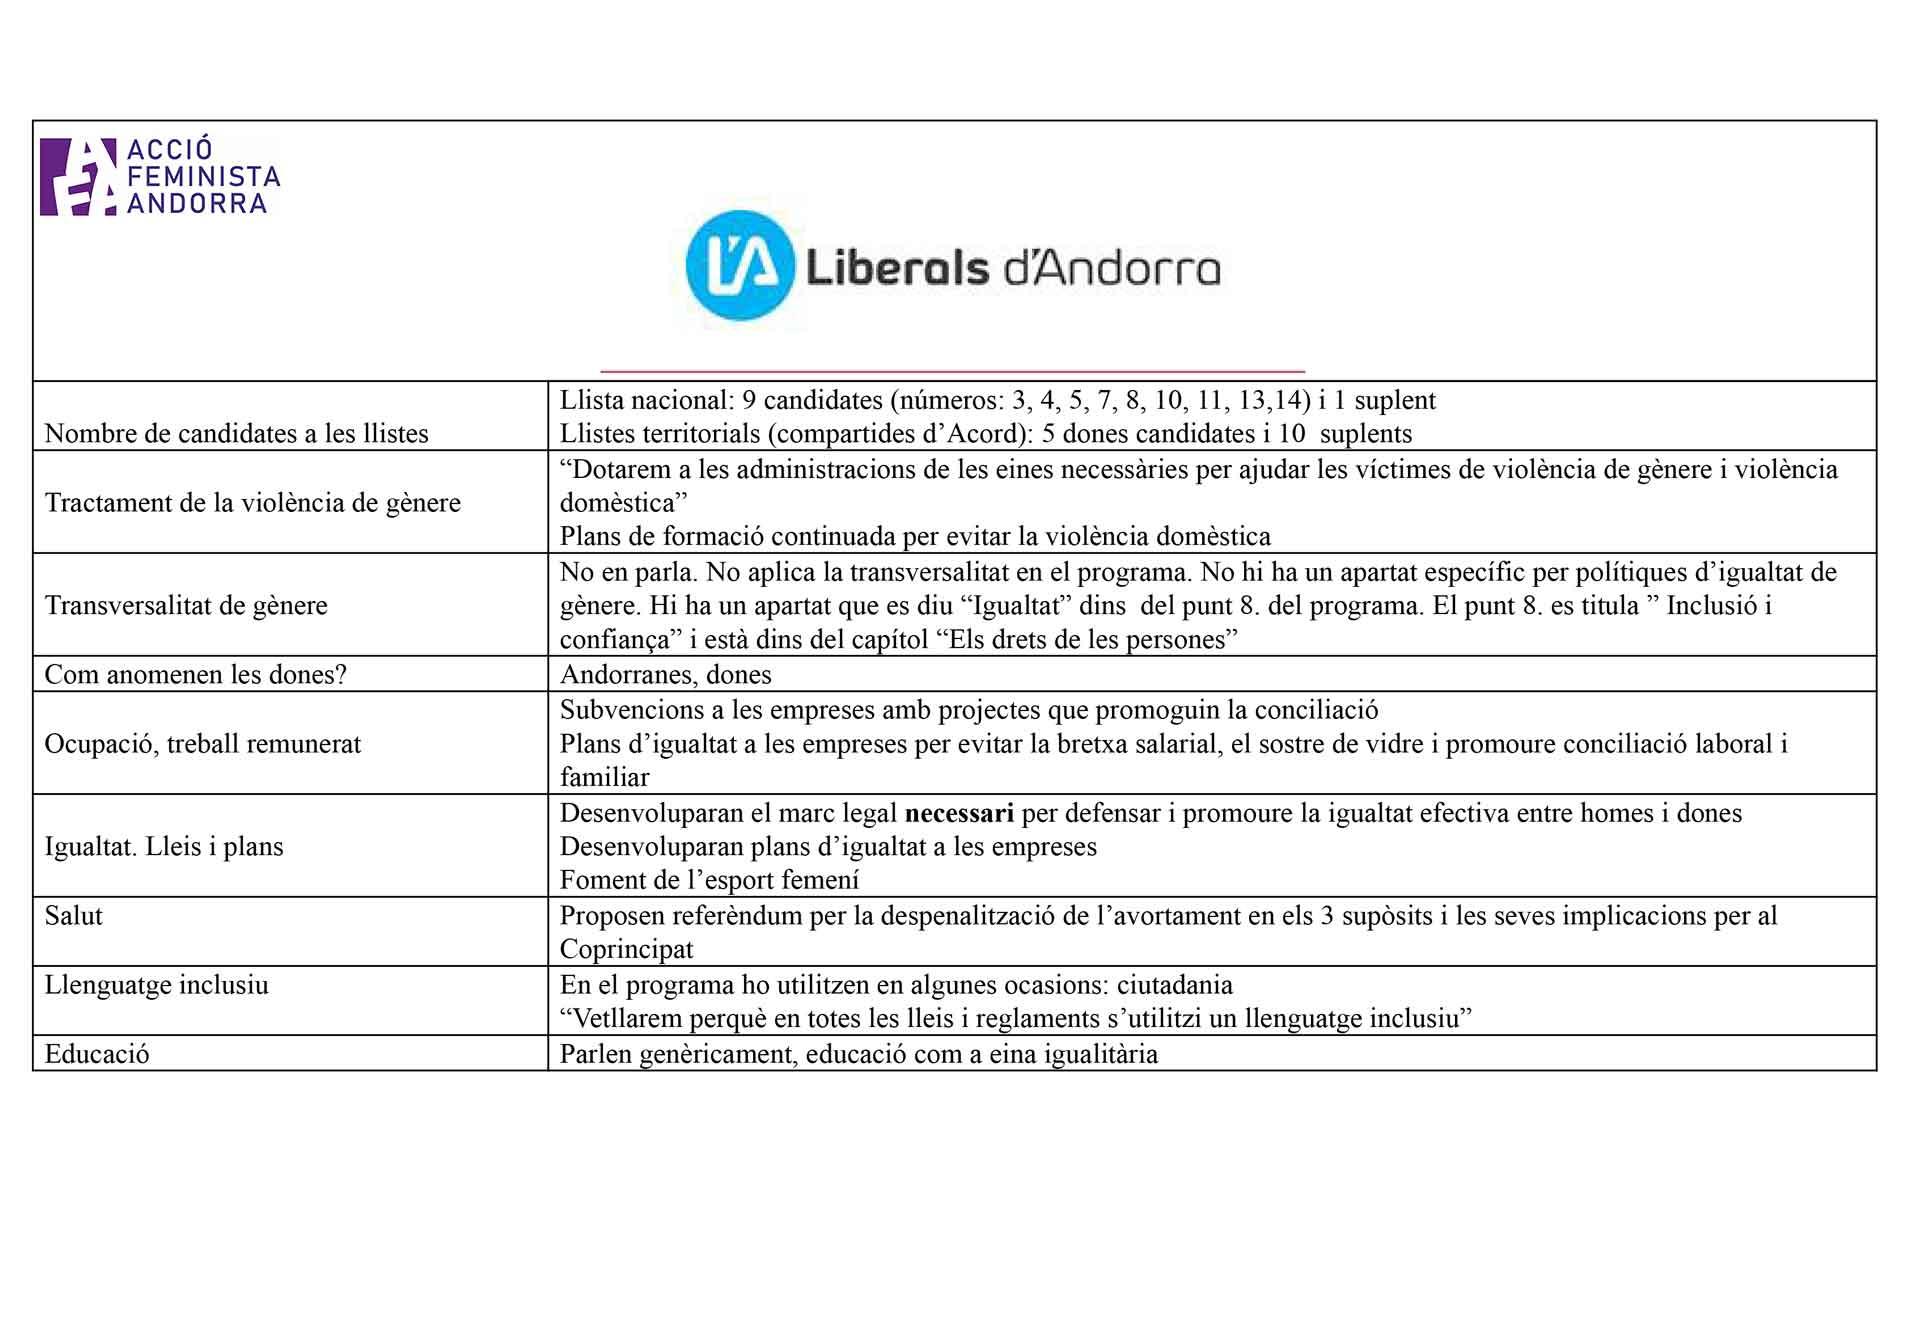 AFA_liberals_analisisgenere_eg19